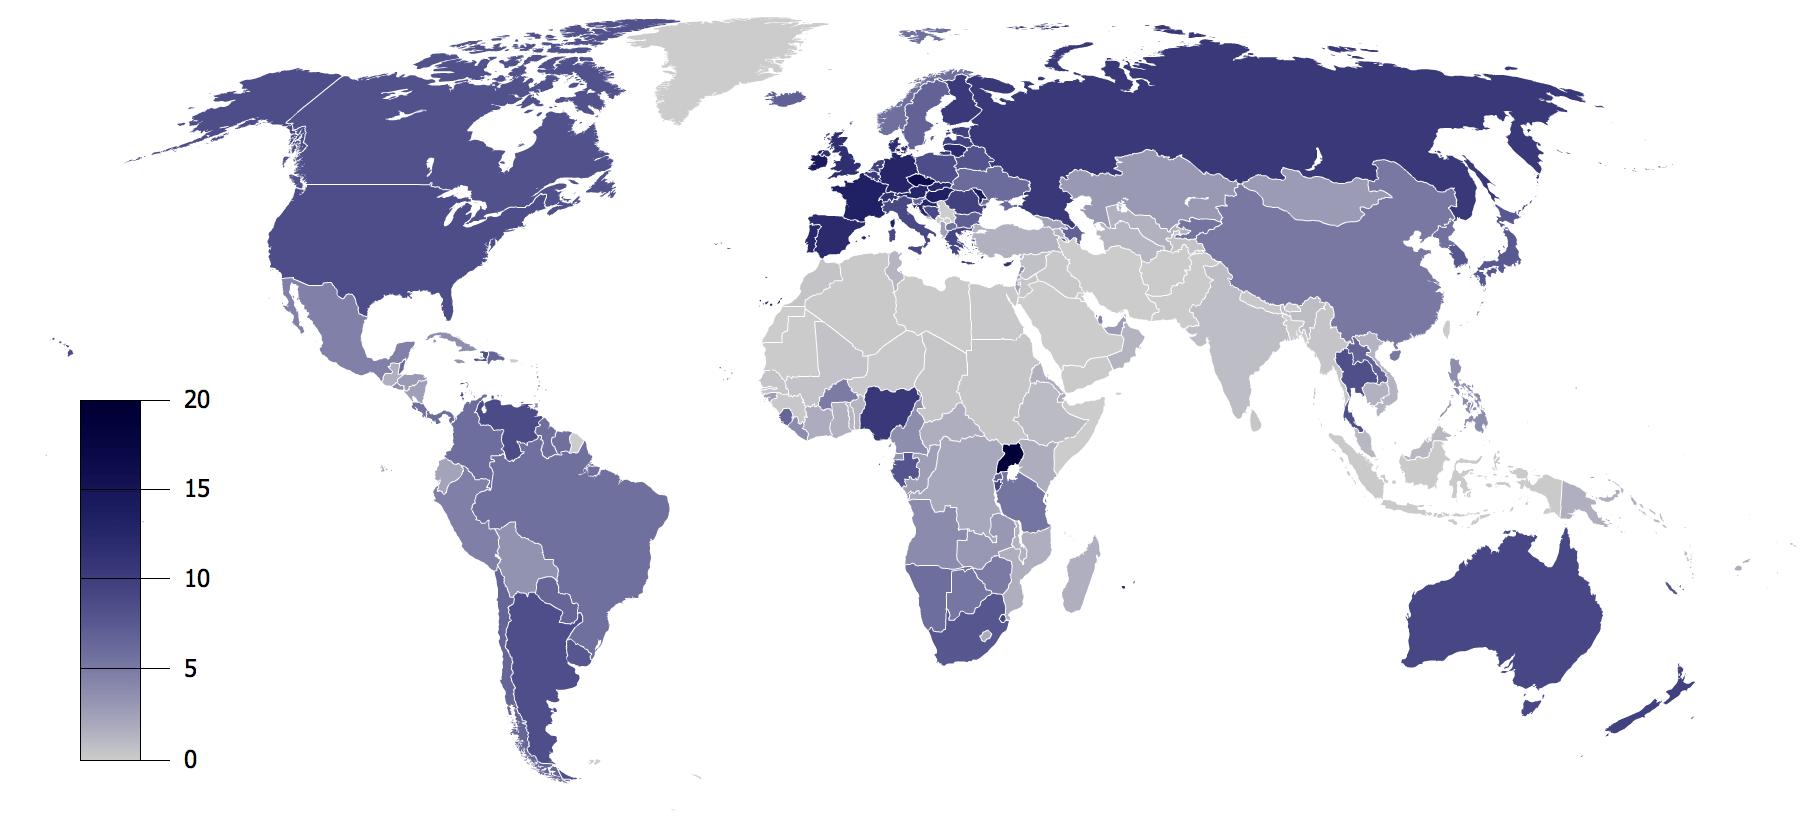 Consumo de alcohol por países